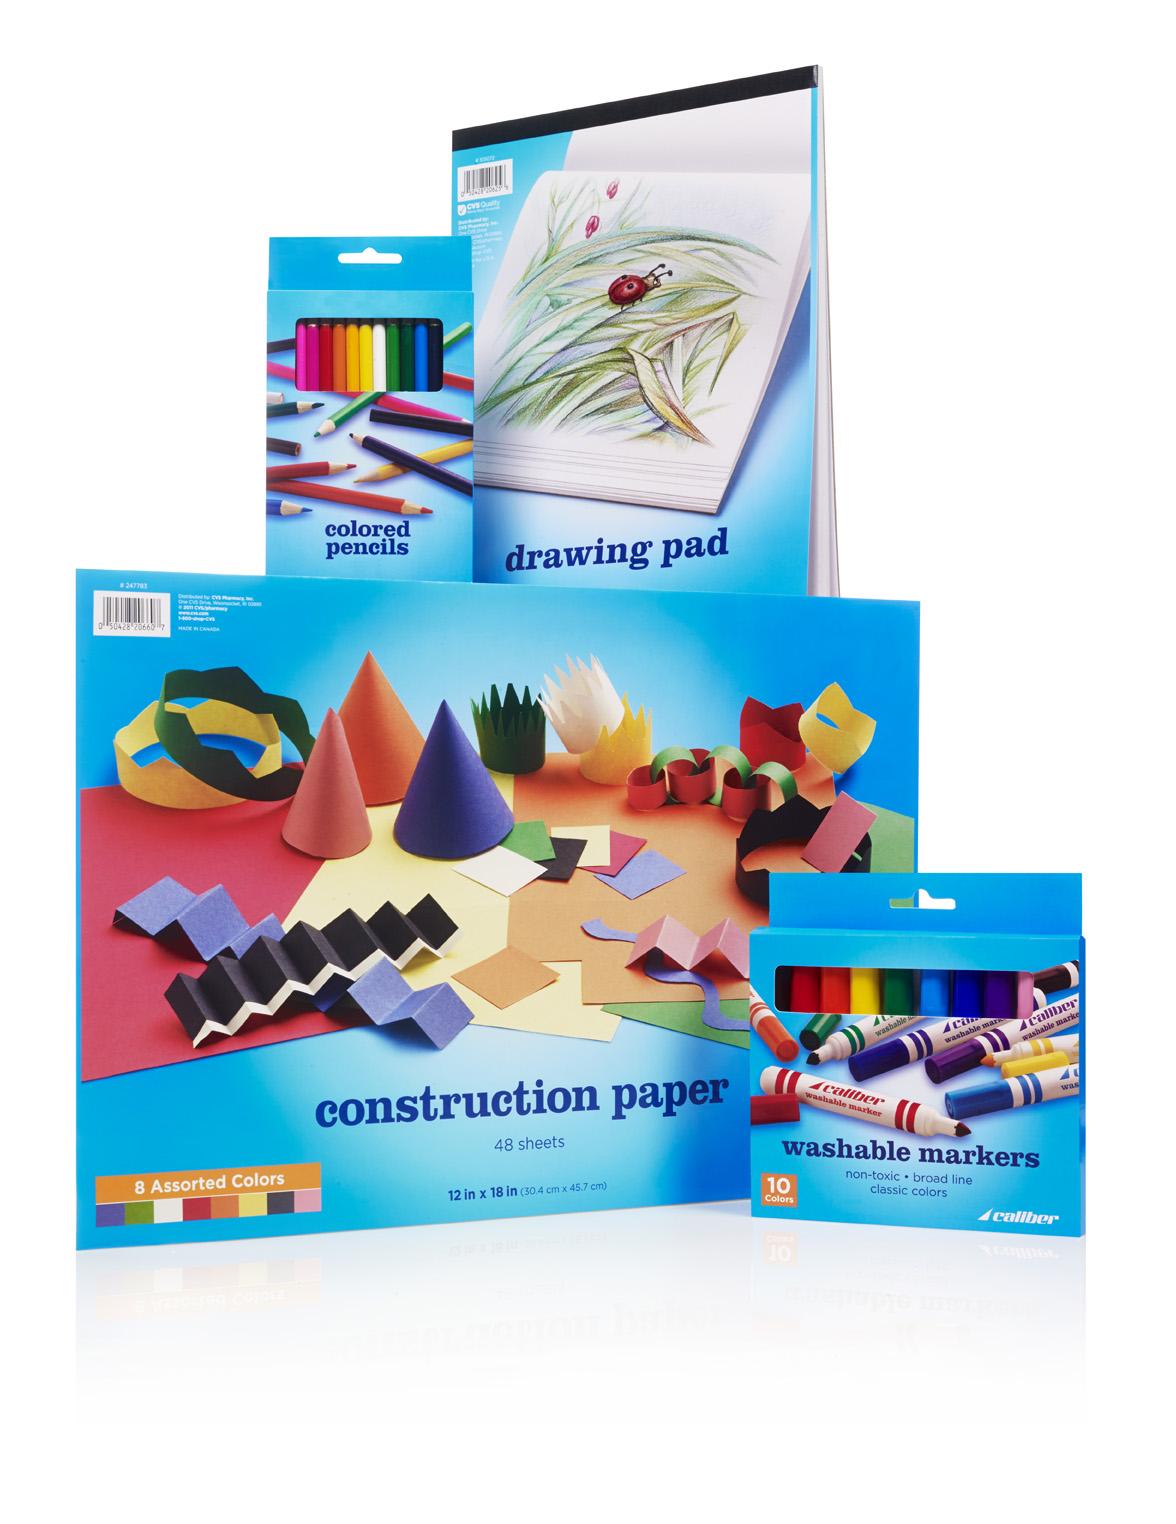 Caliber office and art suppliesrebranding developed for CVS/pharmacy.  Brand development and art direction.